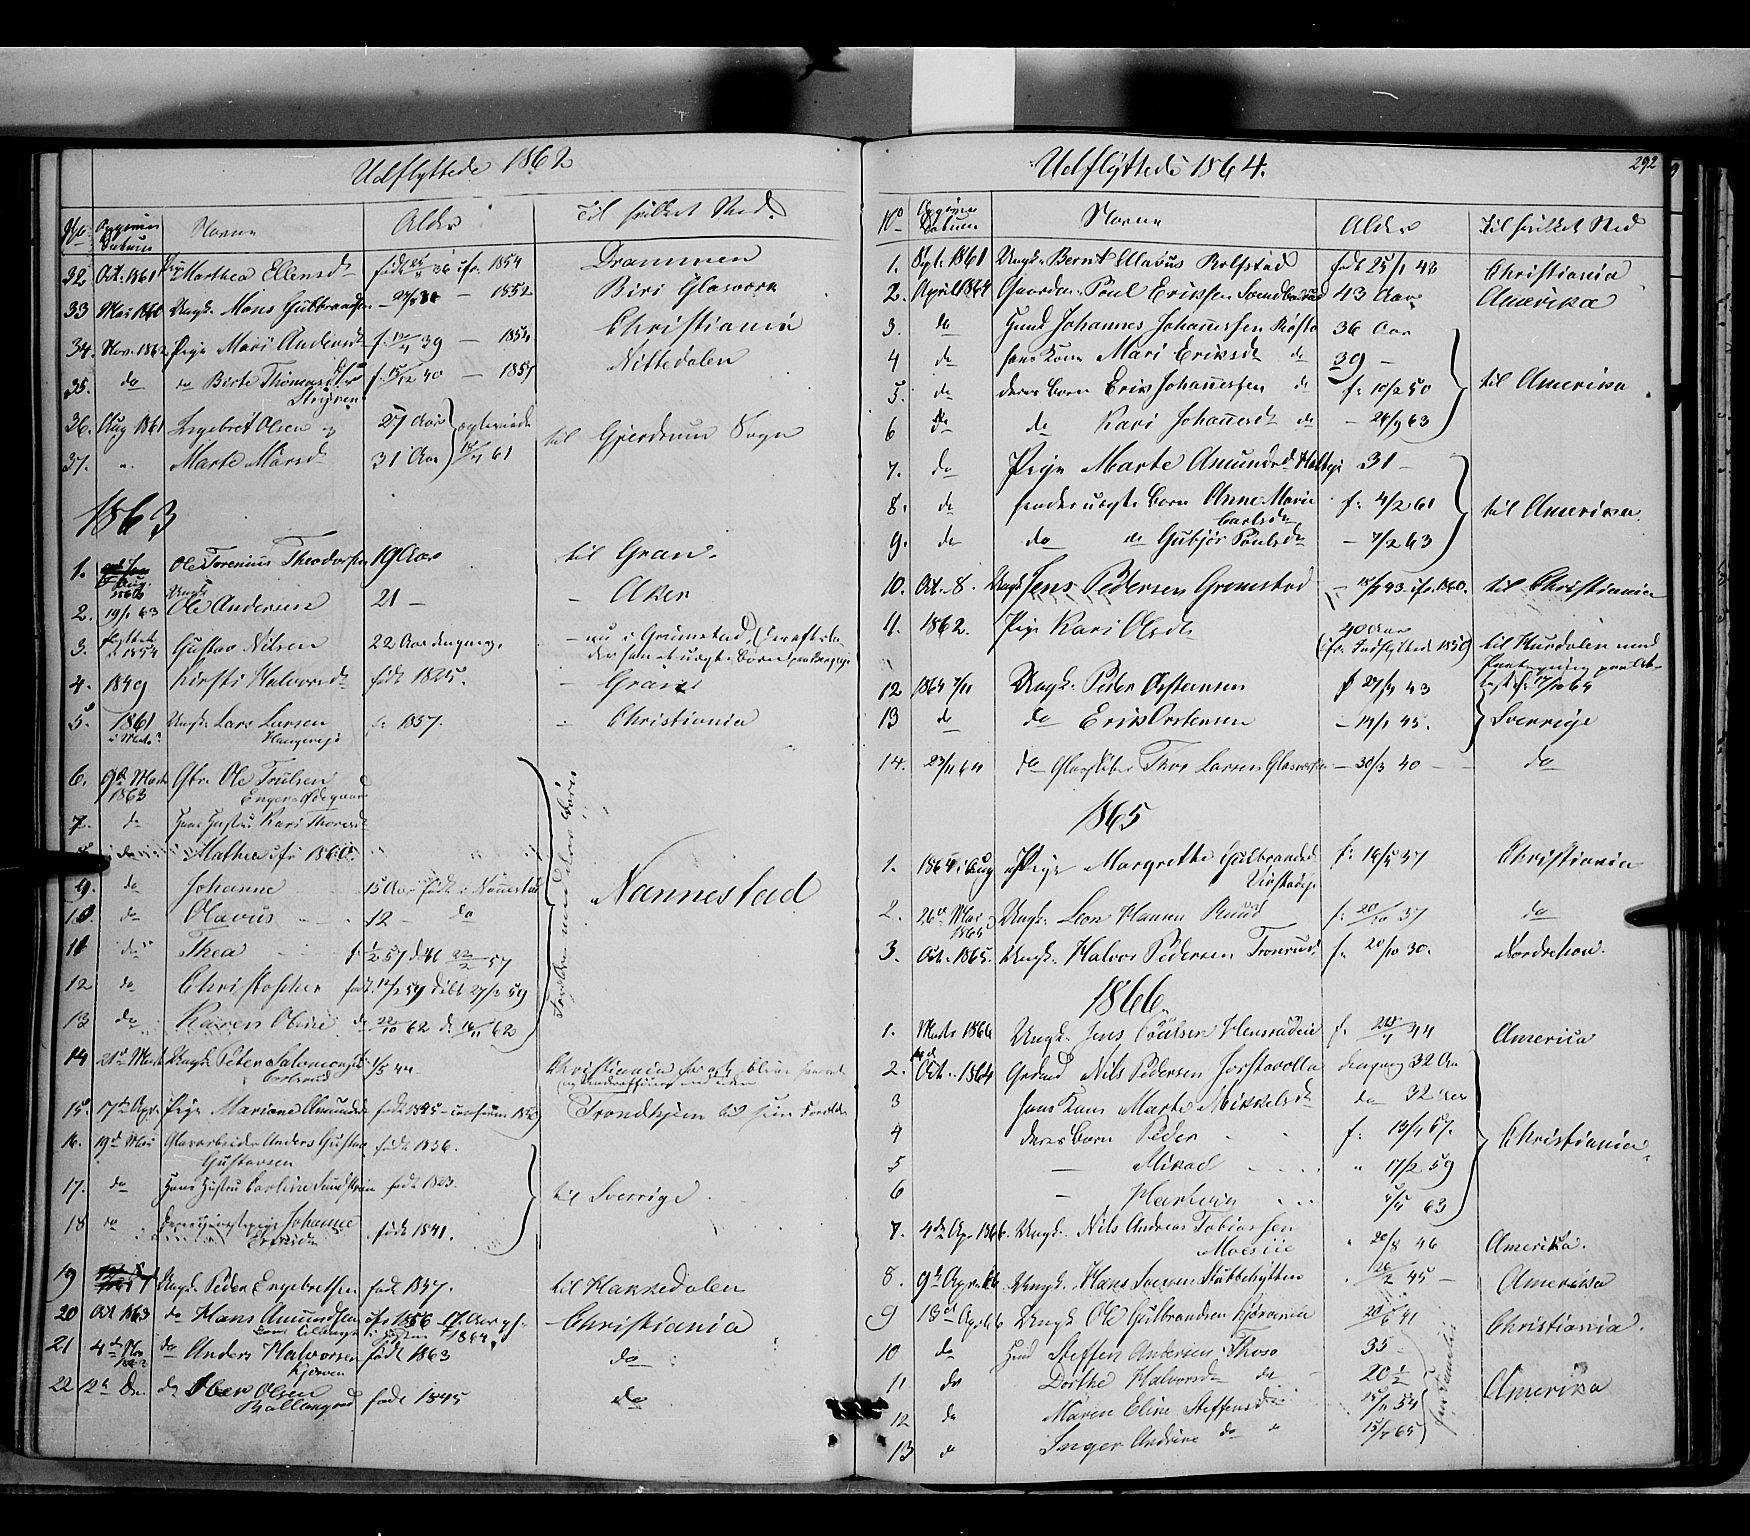 SAH, Jevnaker prestekontor, Ministerialbok nr. 7, 1858-1876, s. 292